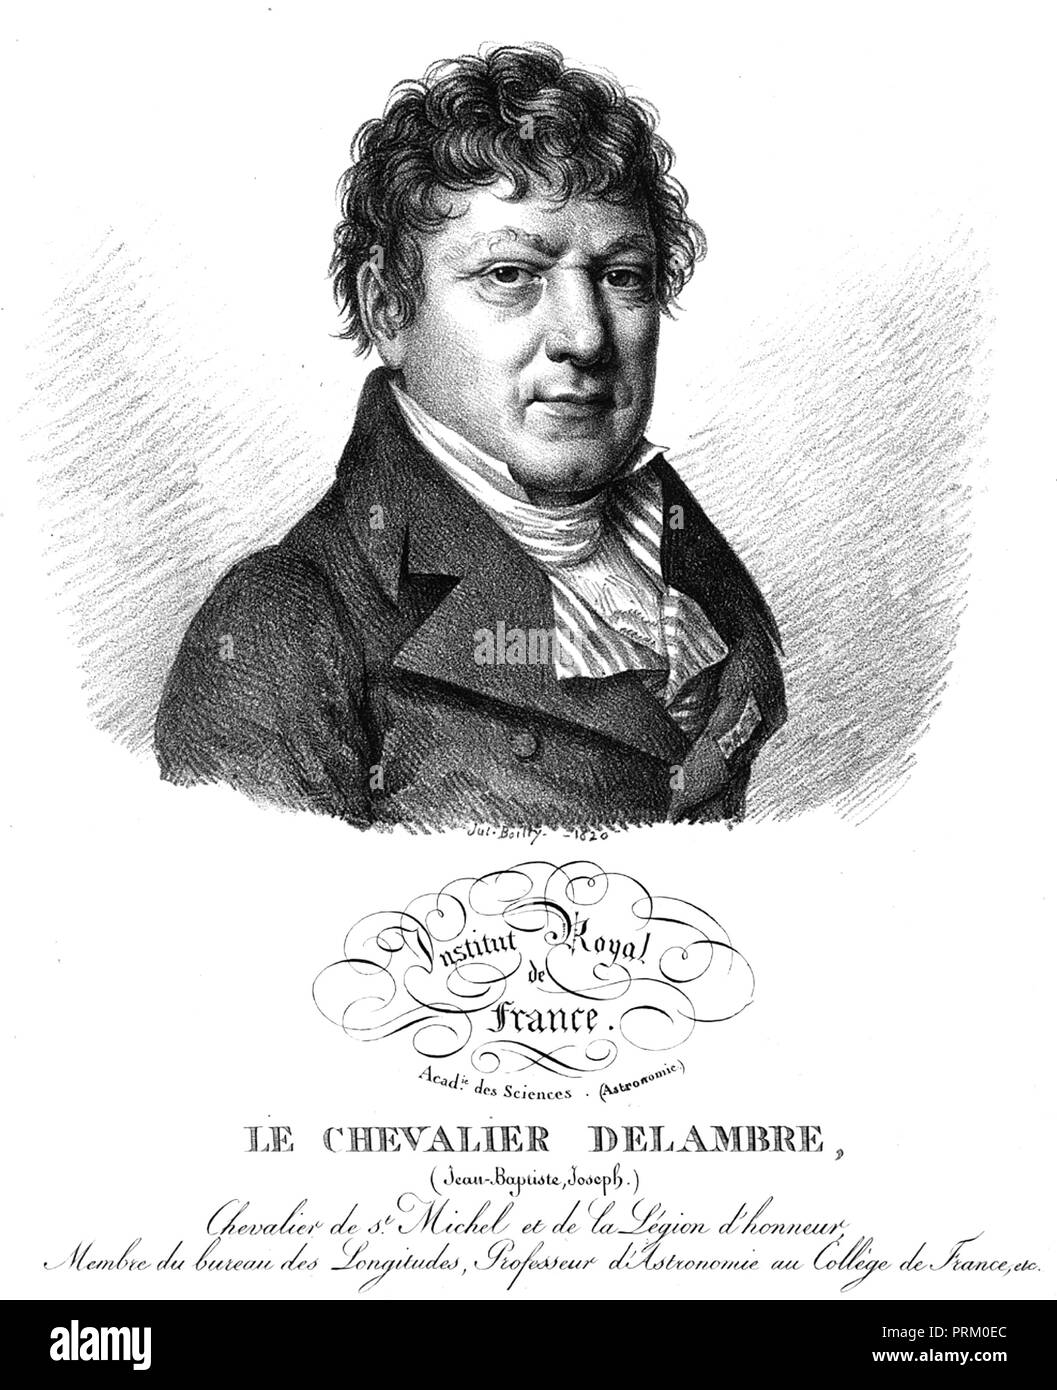 JEAN BAPTISTE DELAMBRE (1749-1822) French mathematician and astronomer - Stock Image